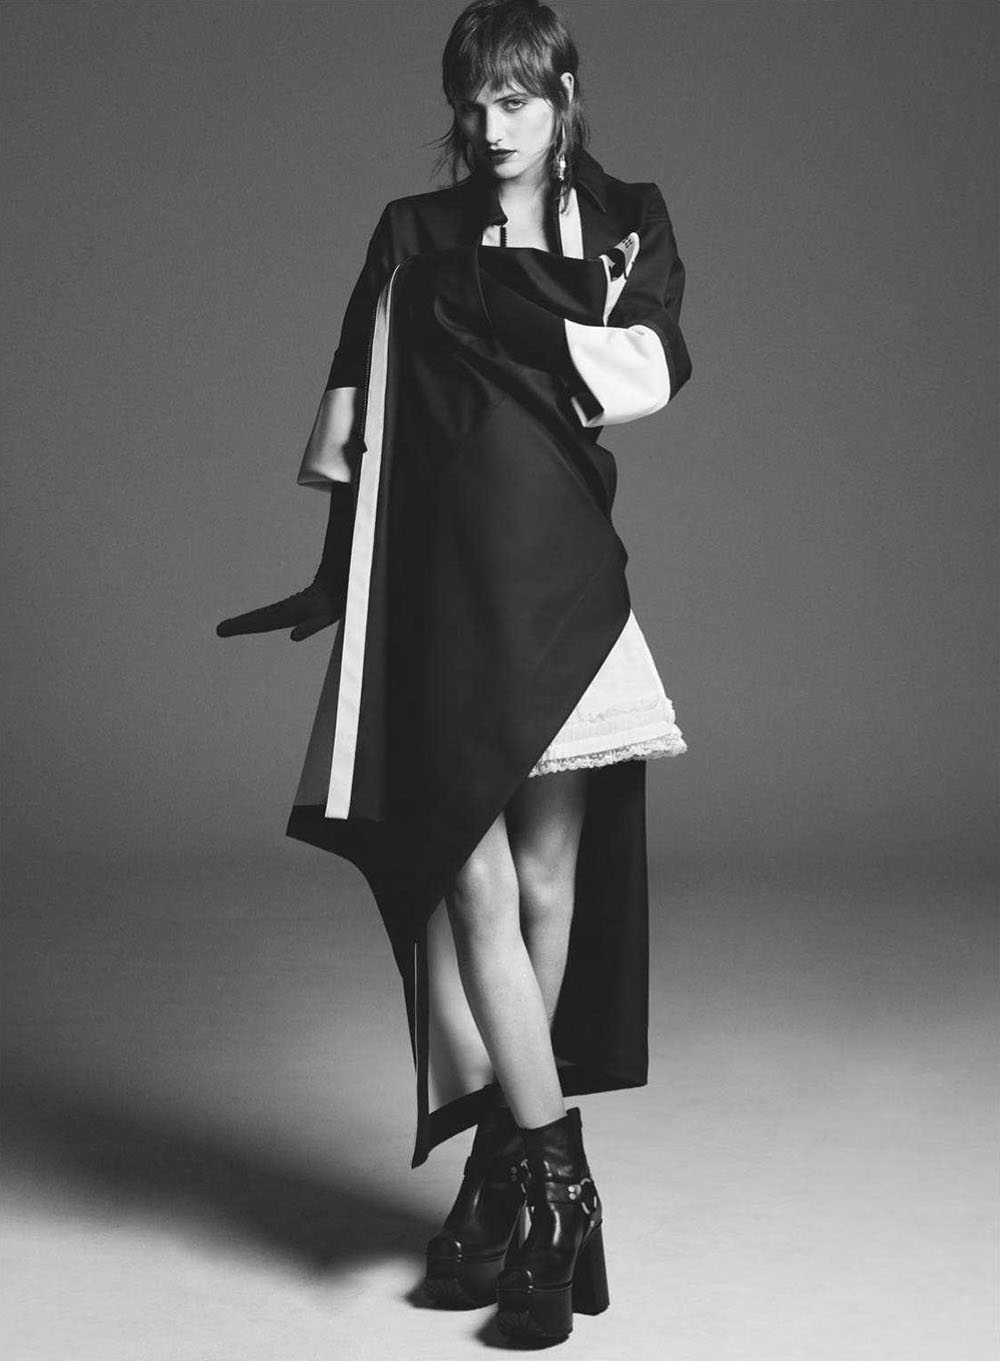 Jess Cole and Sarah Brown by Karim Sadli for British Vogue October 2018